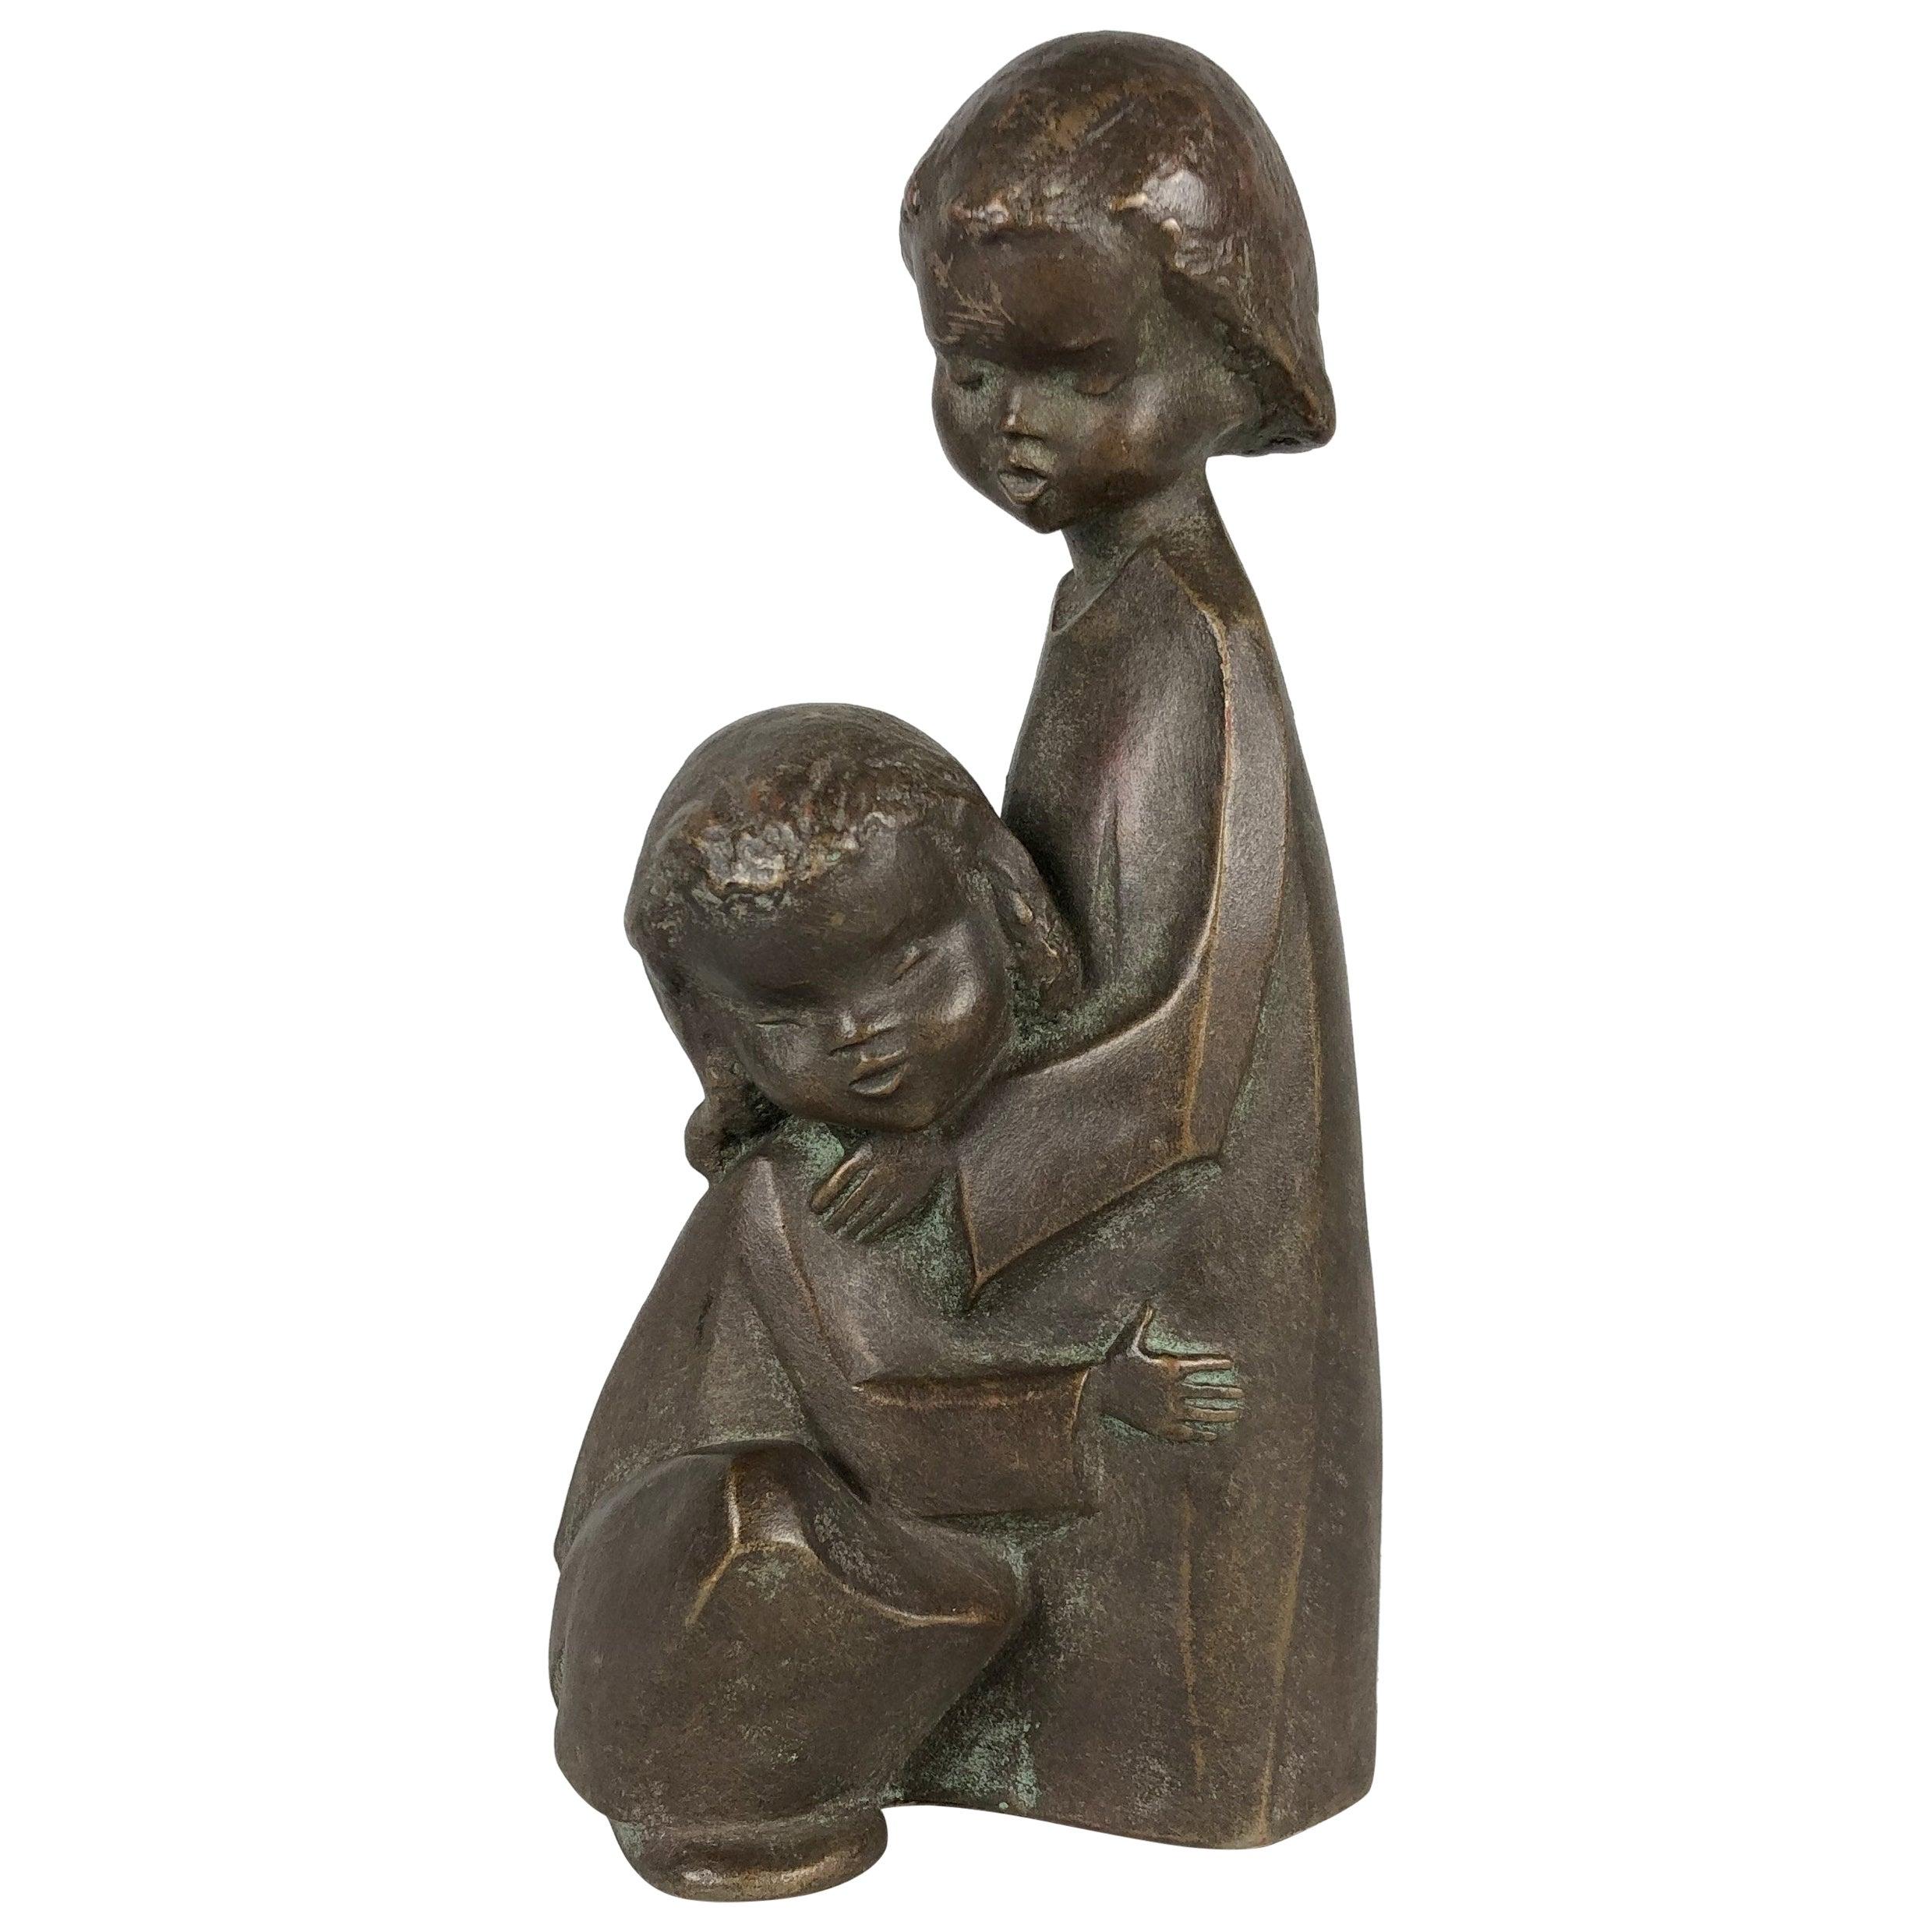 Vintage Handmade Achatit Sculpture, Germany, 1970s